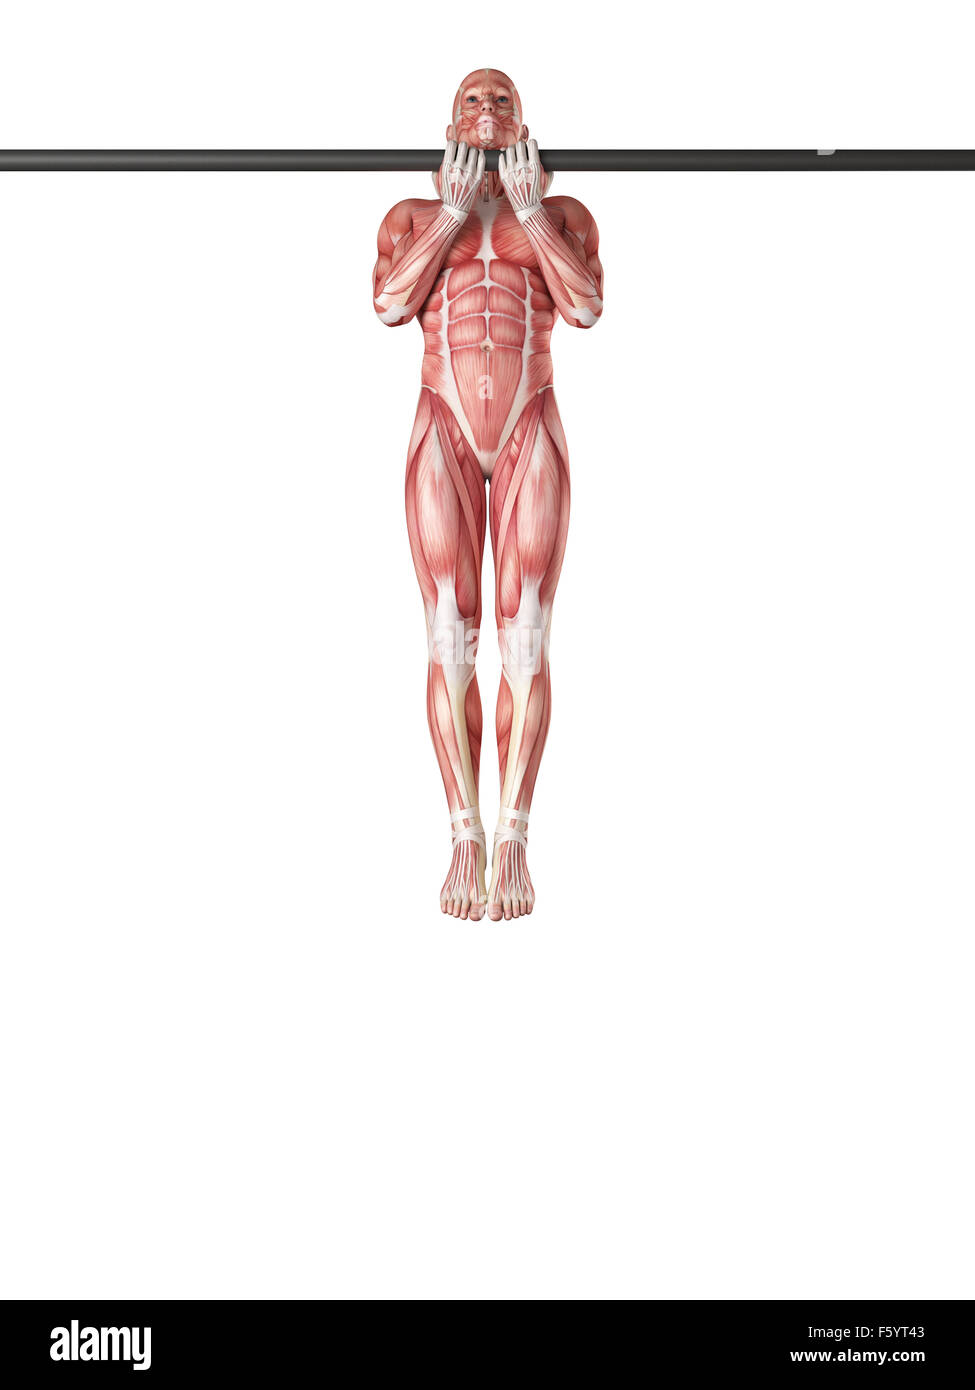 exercise illustration - close grip chin up Stock Photo: 89736755 - Alamy